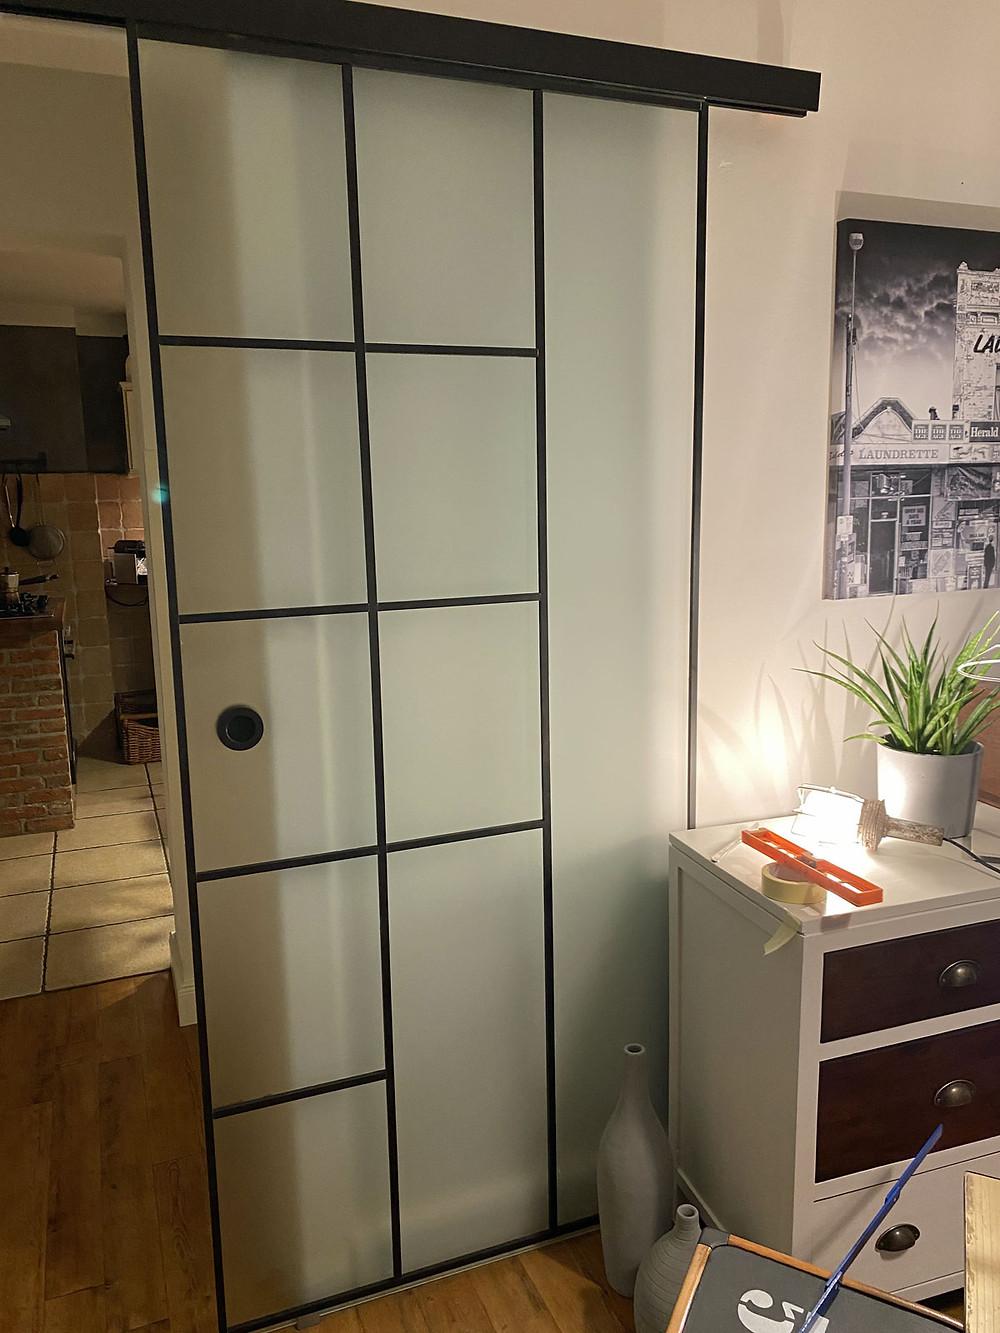 Glastür Upcycling mit Holz DIY Crittall Sprossentür